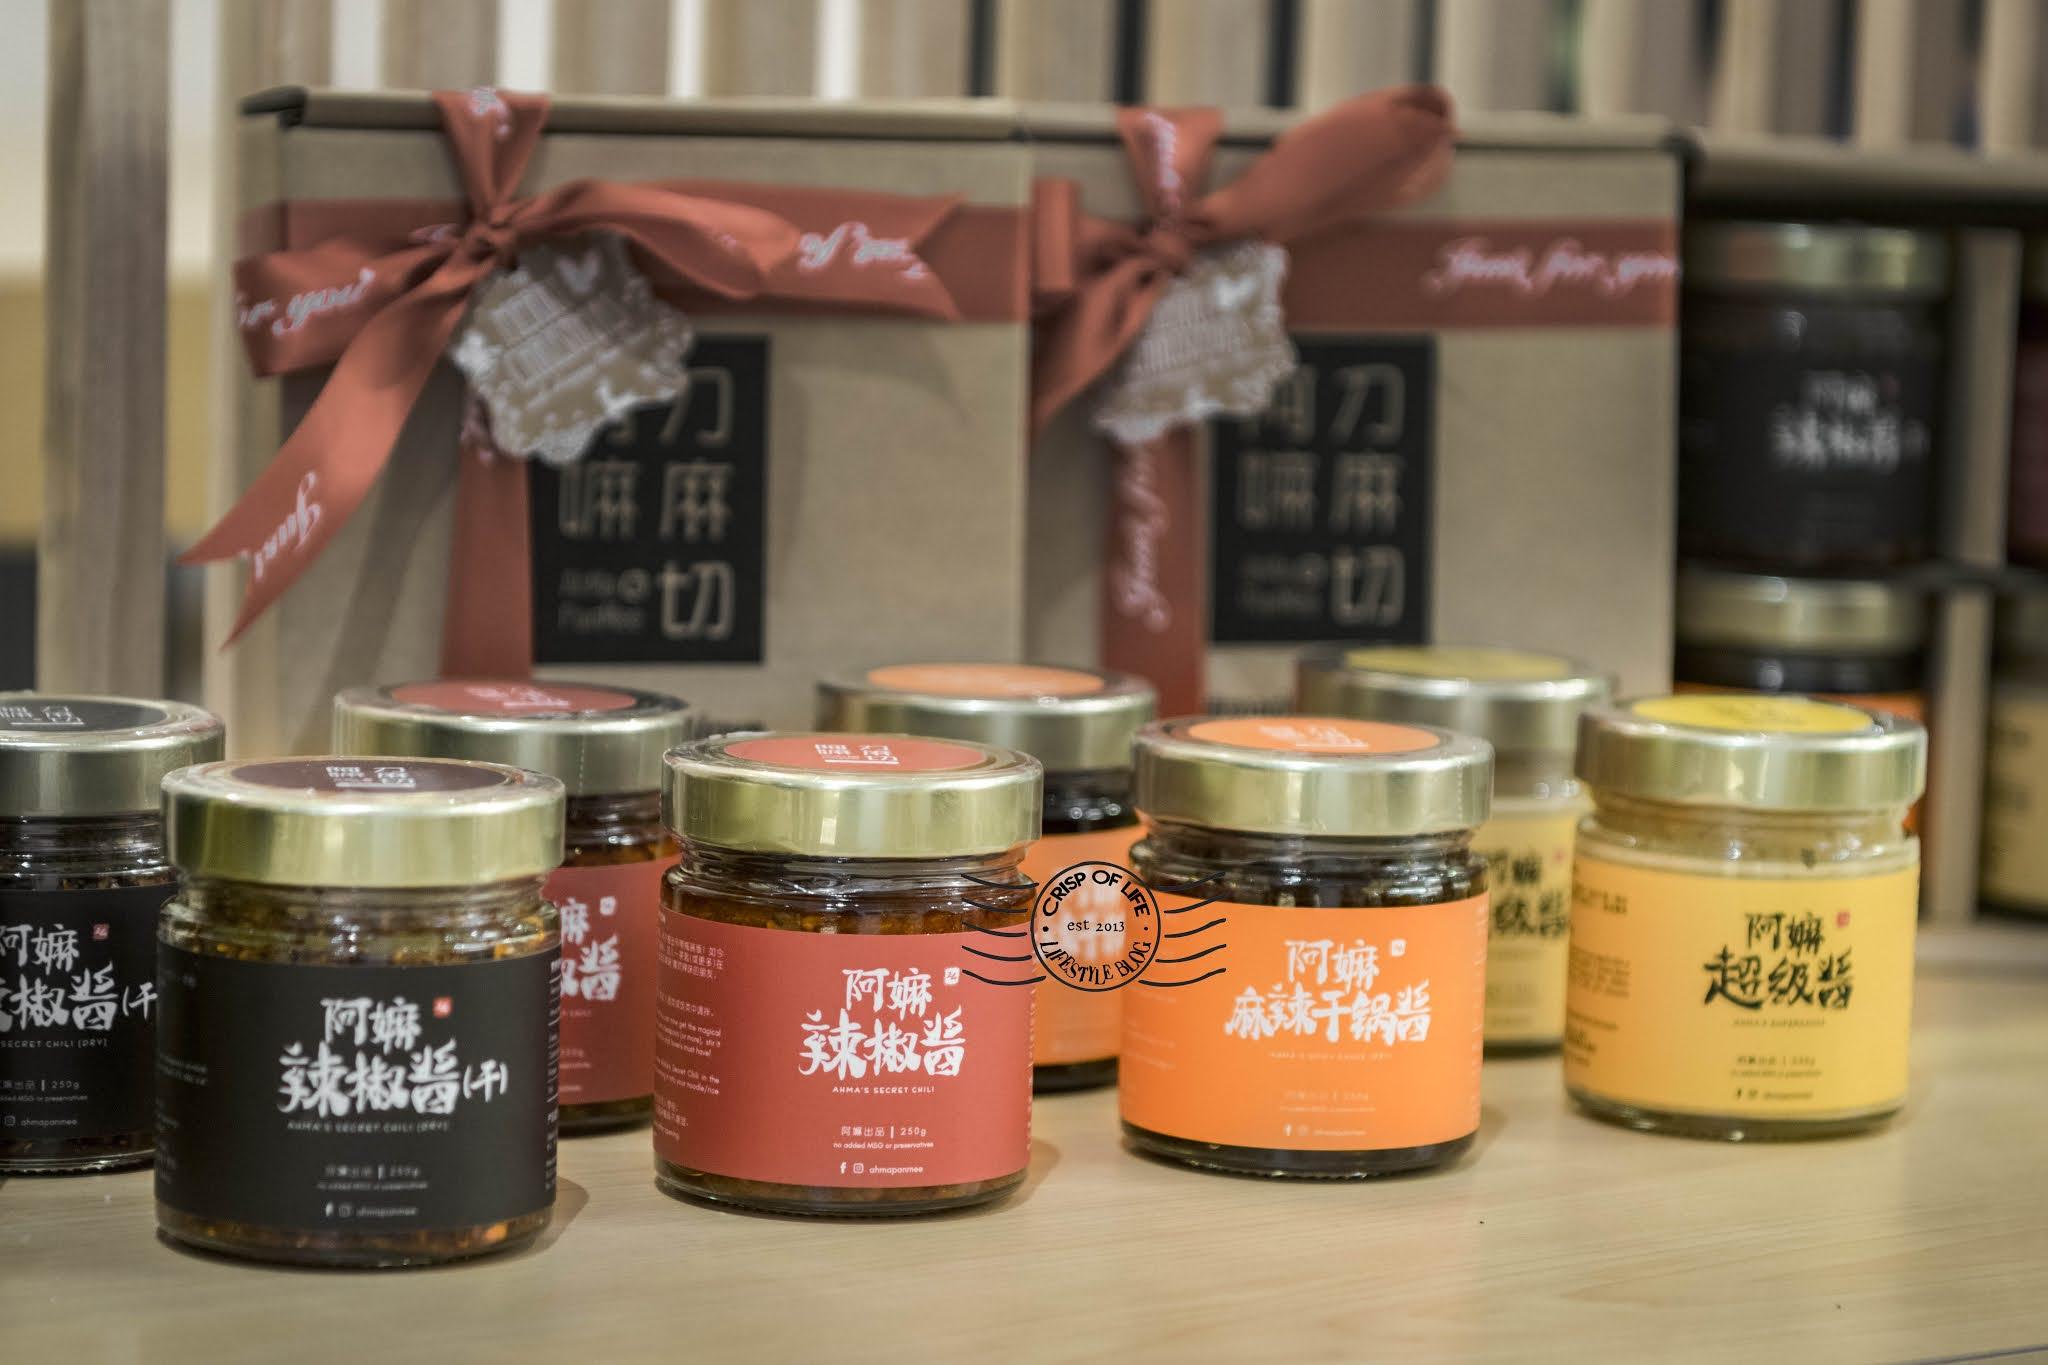 AhMa PanMee 阿嫲刀麻切 has expanded to Eco Bloom at Simpang Ampat Penang!